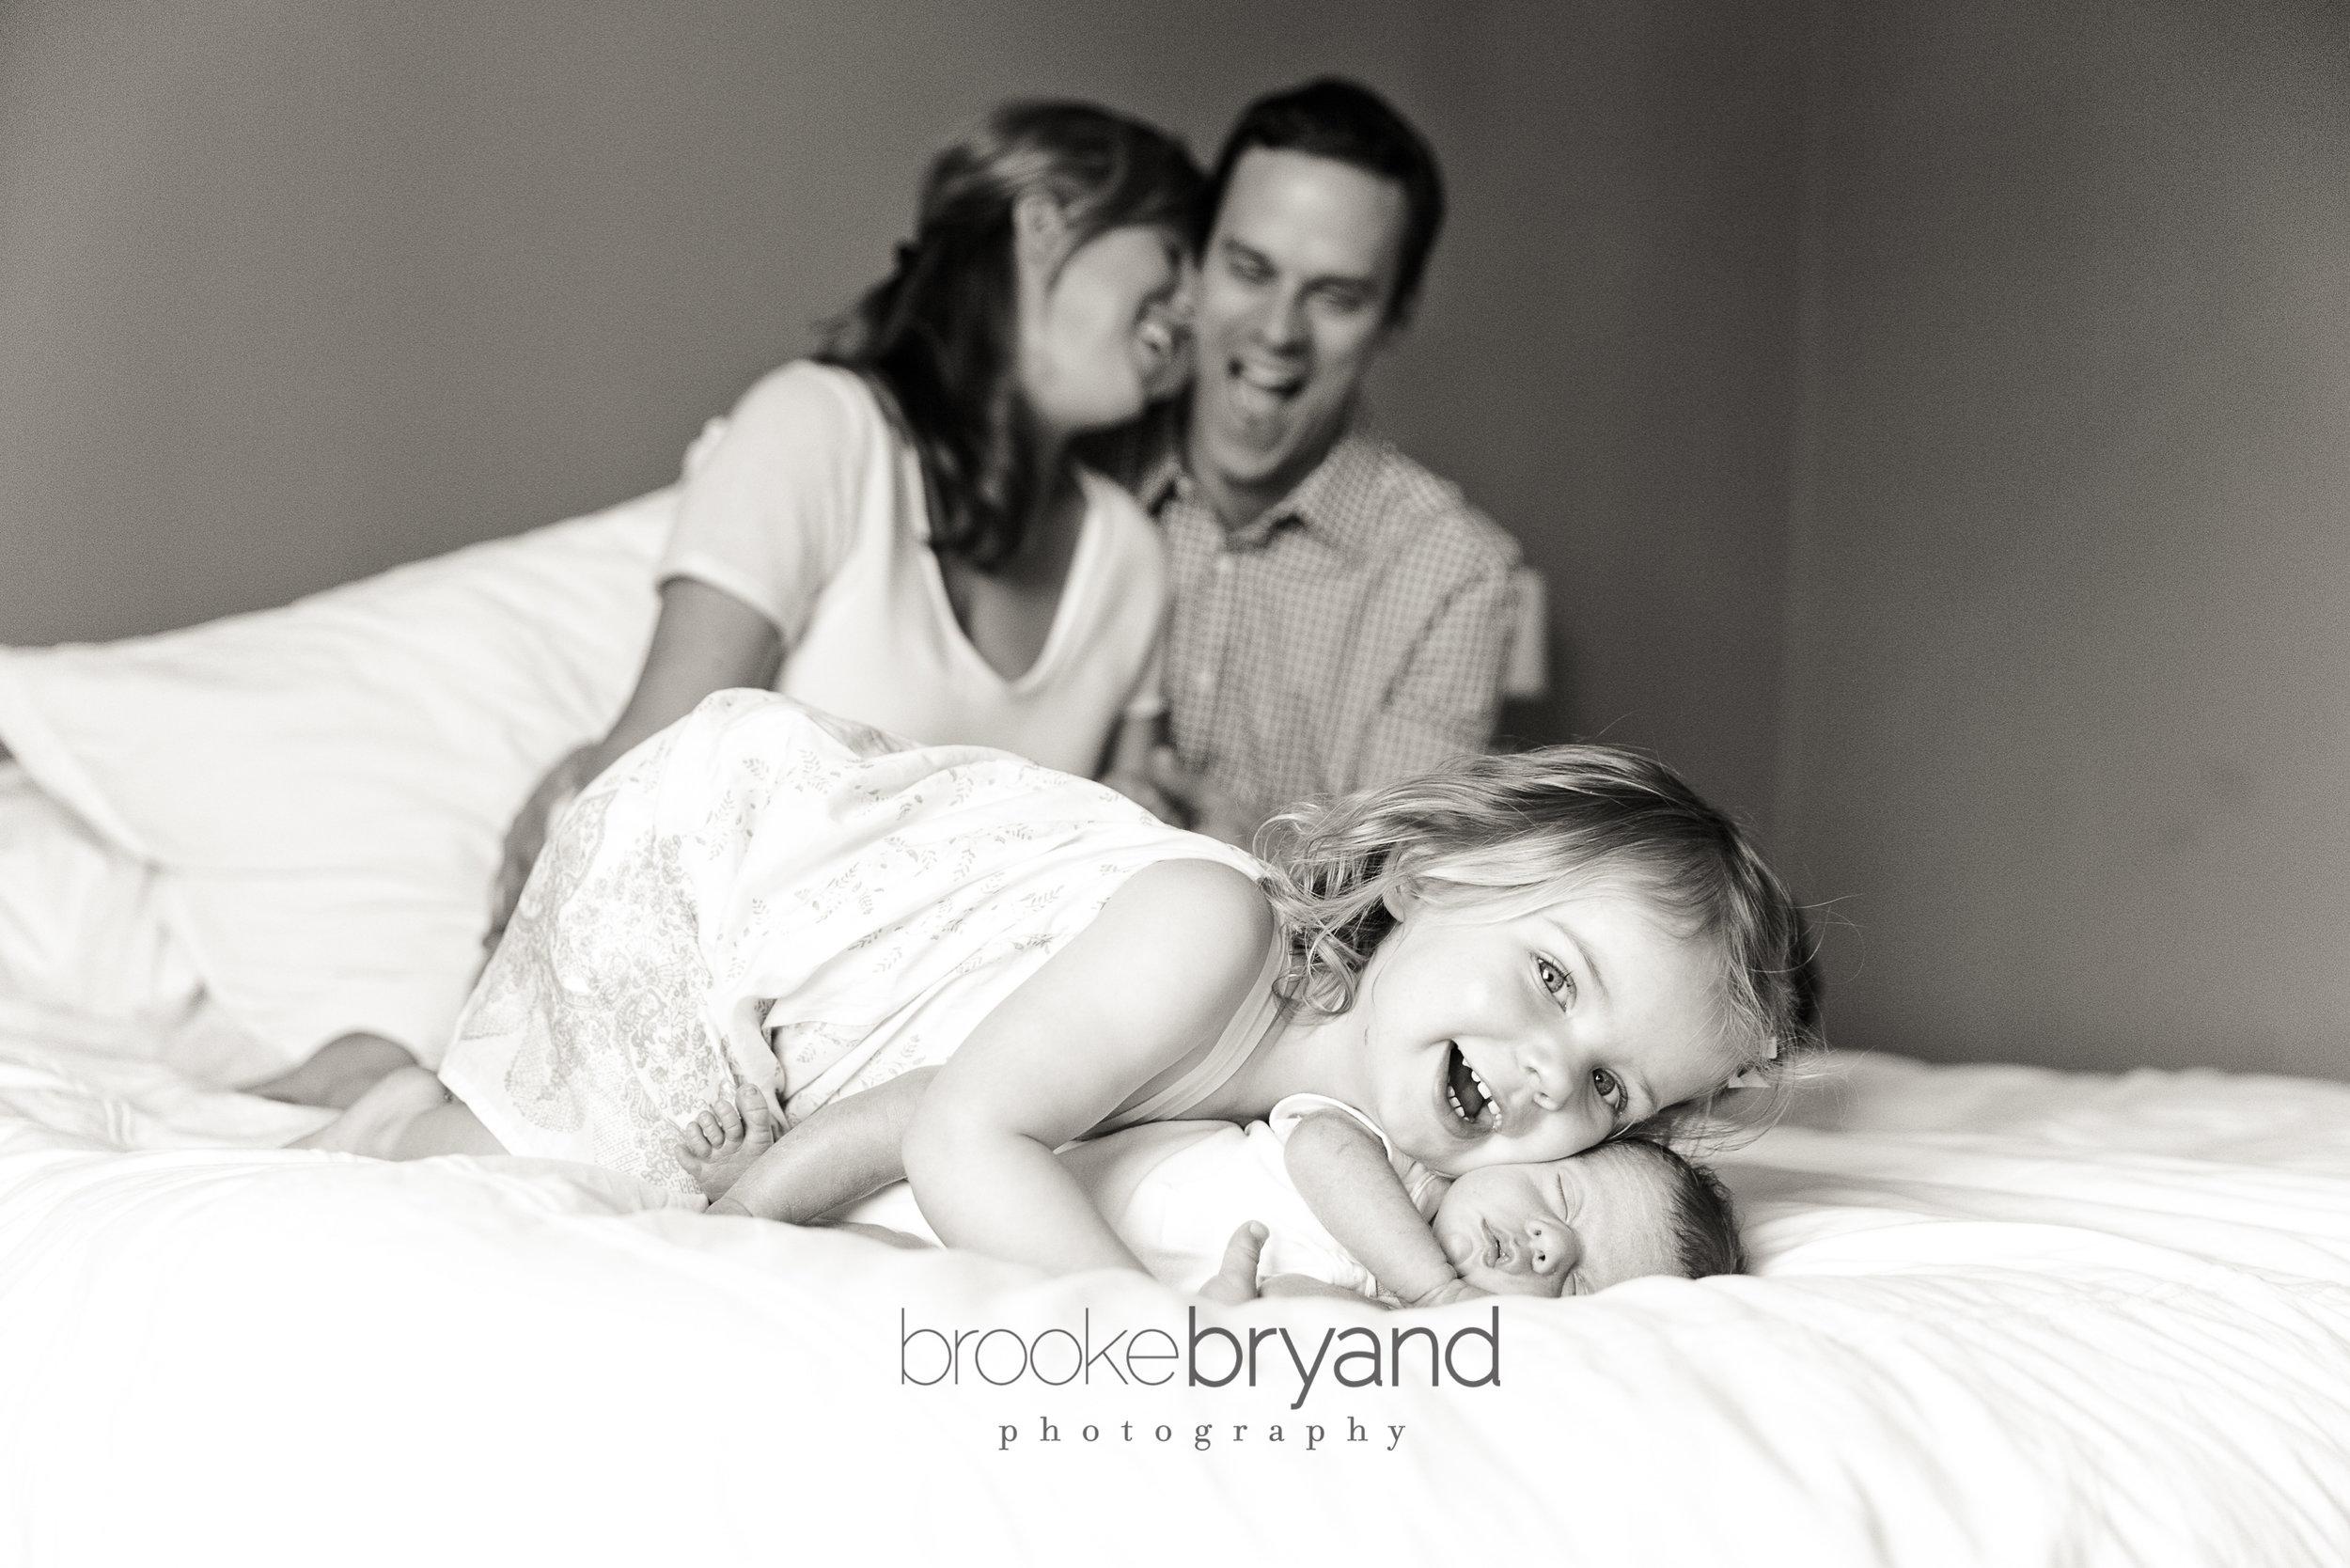 2up-johnson-san-francisco-newborn-photographer-brooke-bryand-photography-2.jpg